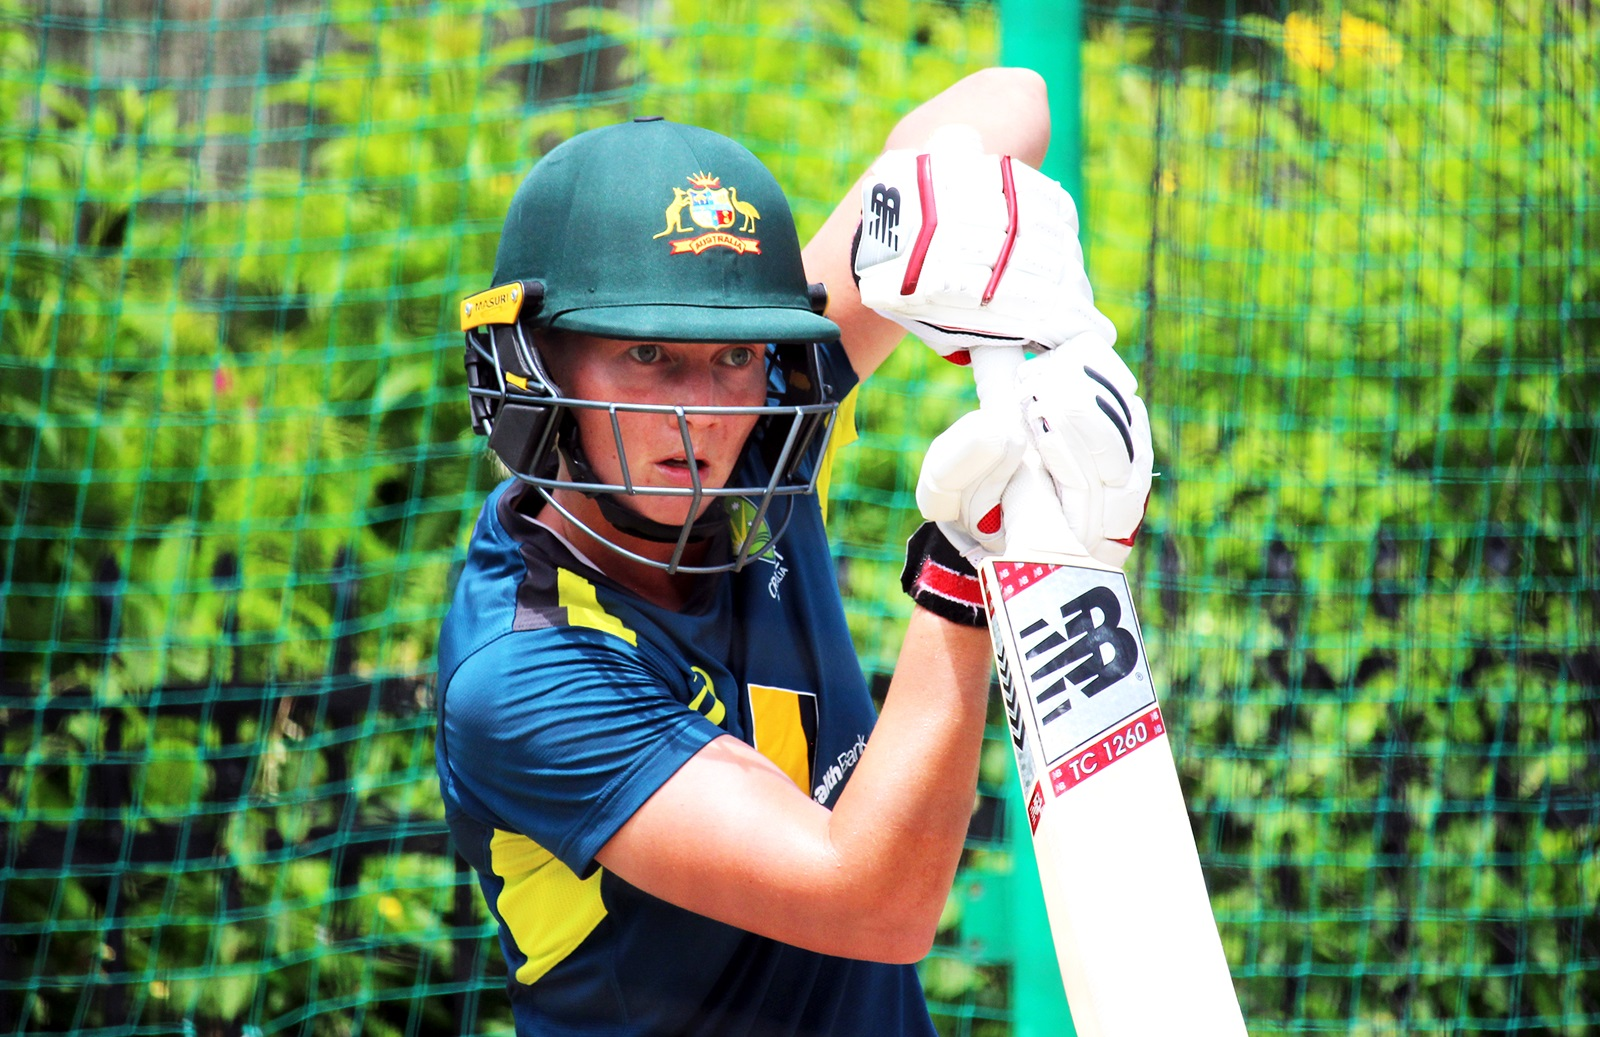 Lanning expecting stiff challenge in series opener | cricket